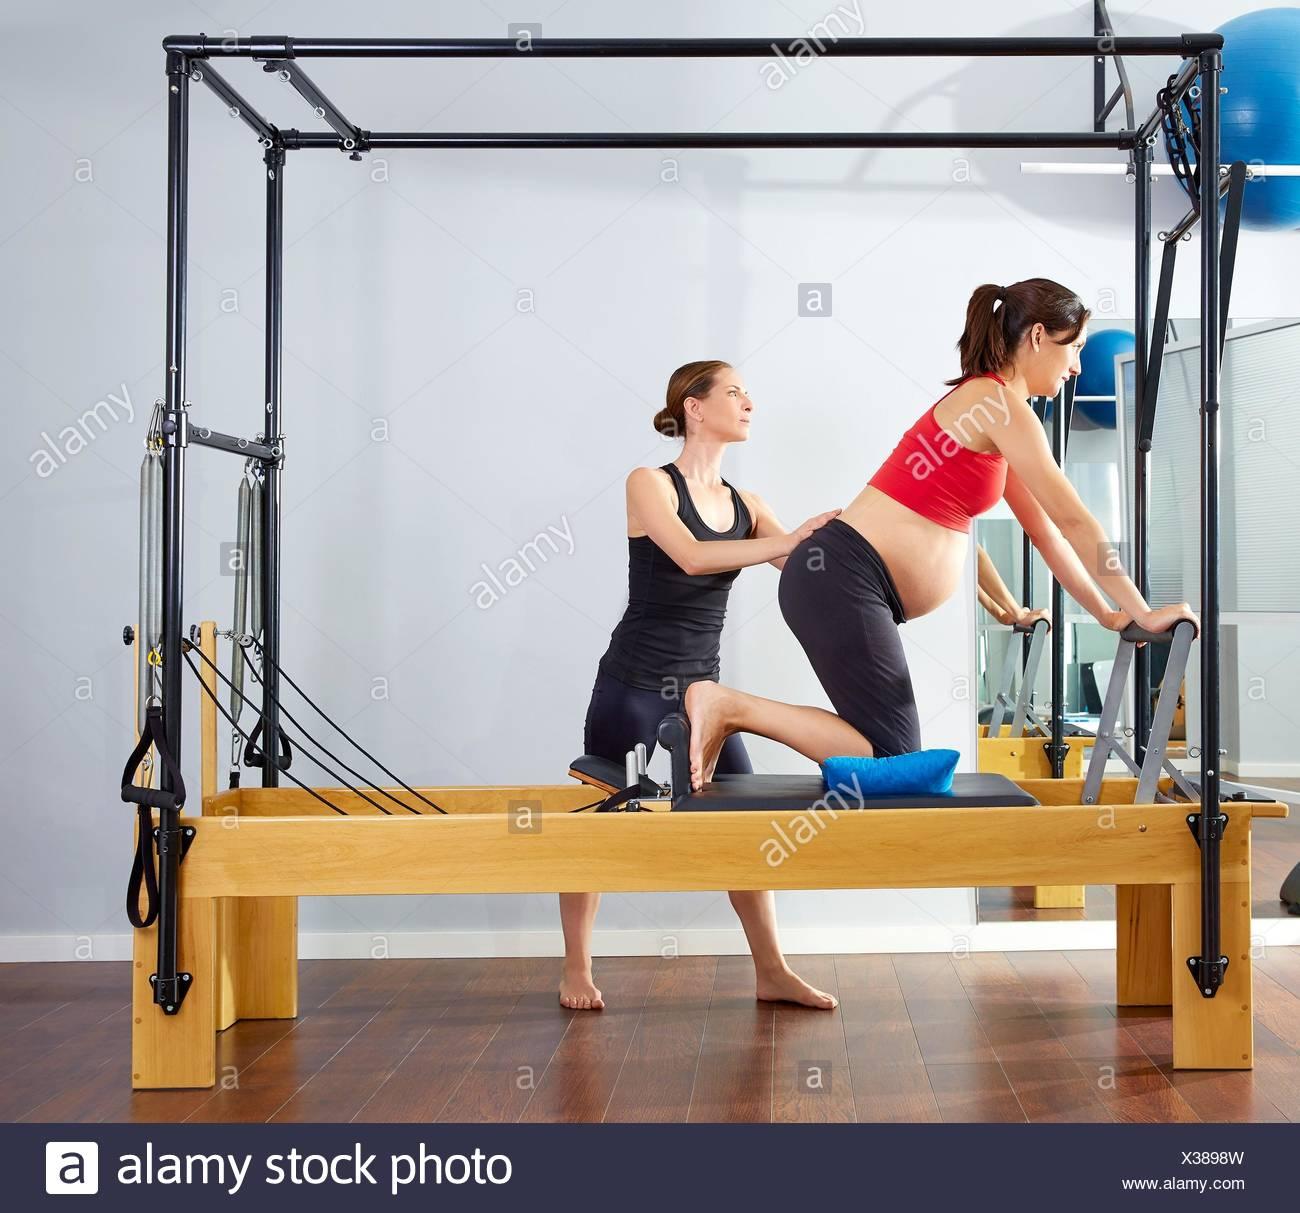 Woman Pilates Chair Exercises Fitness Stock Photo: Cadillac Interior Stock Photos & Cadillac Interior Stock